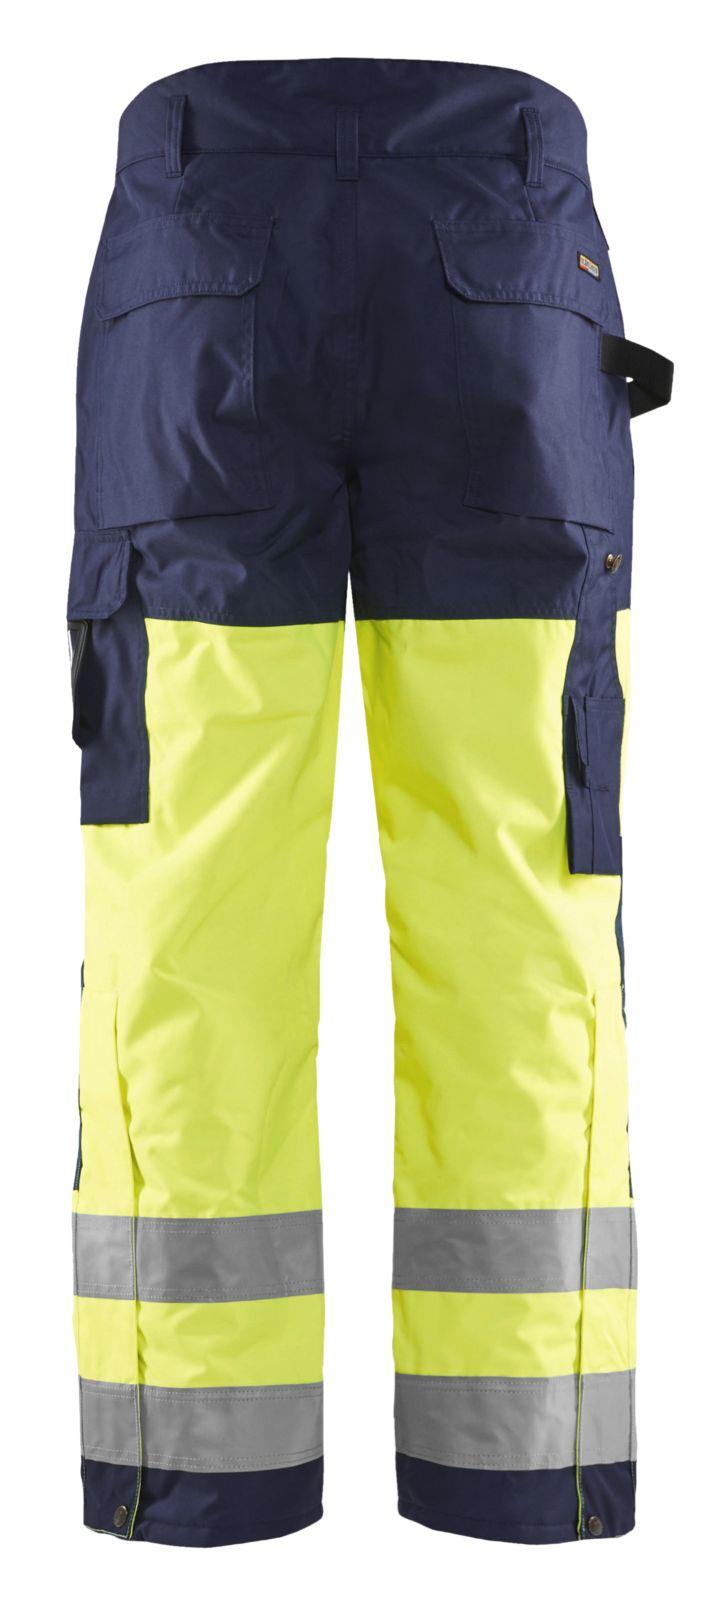 Blaklader Winterbroeken 18831997 High Vis geel-marineblauw(3389)